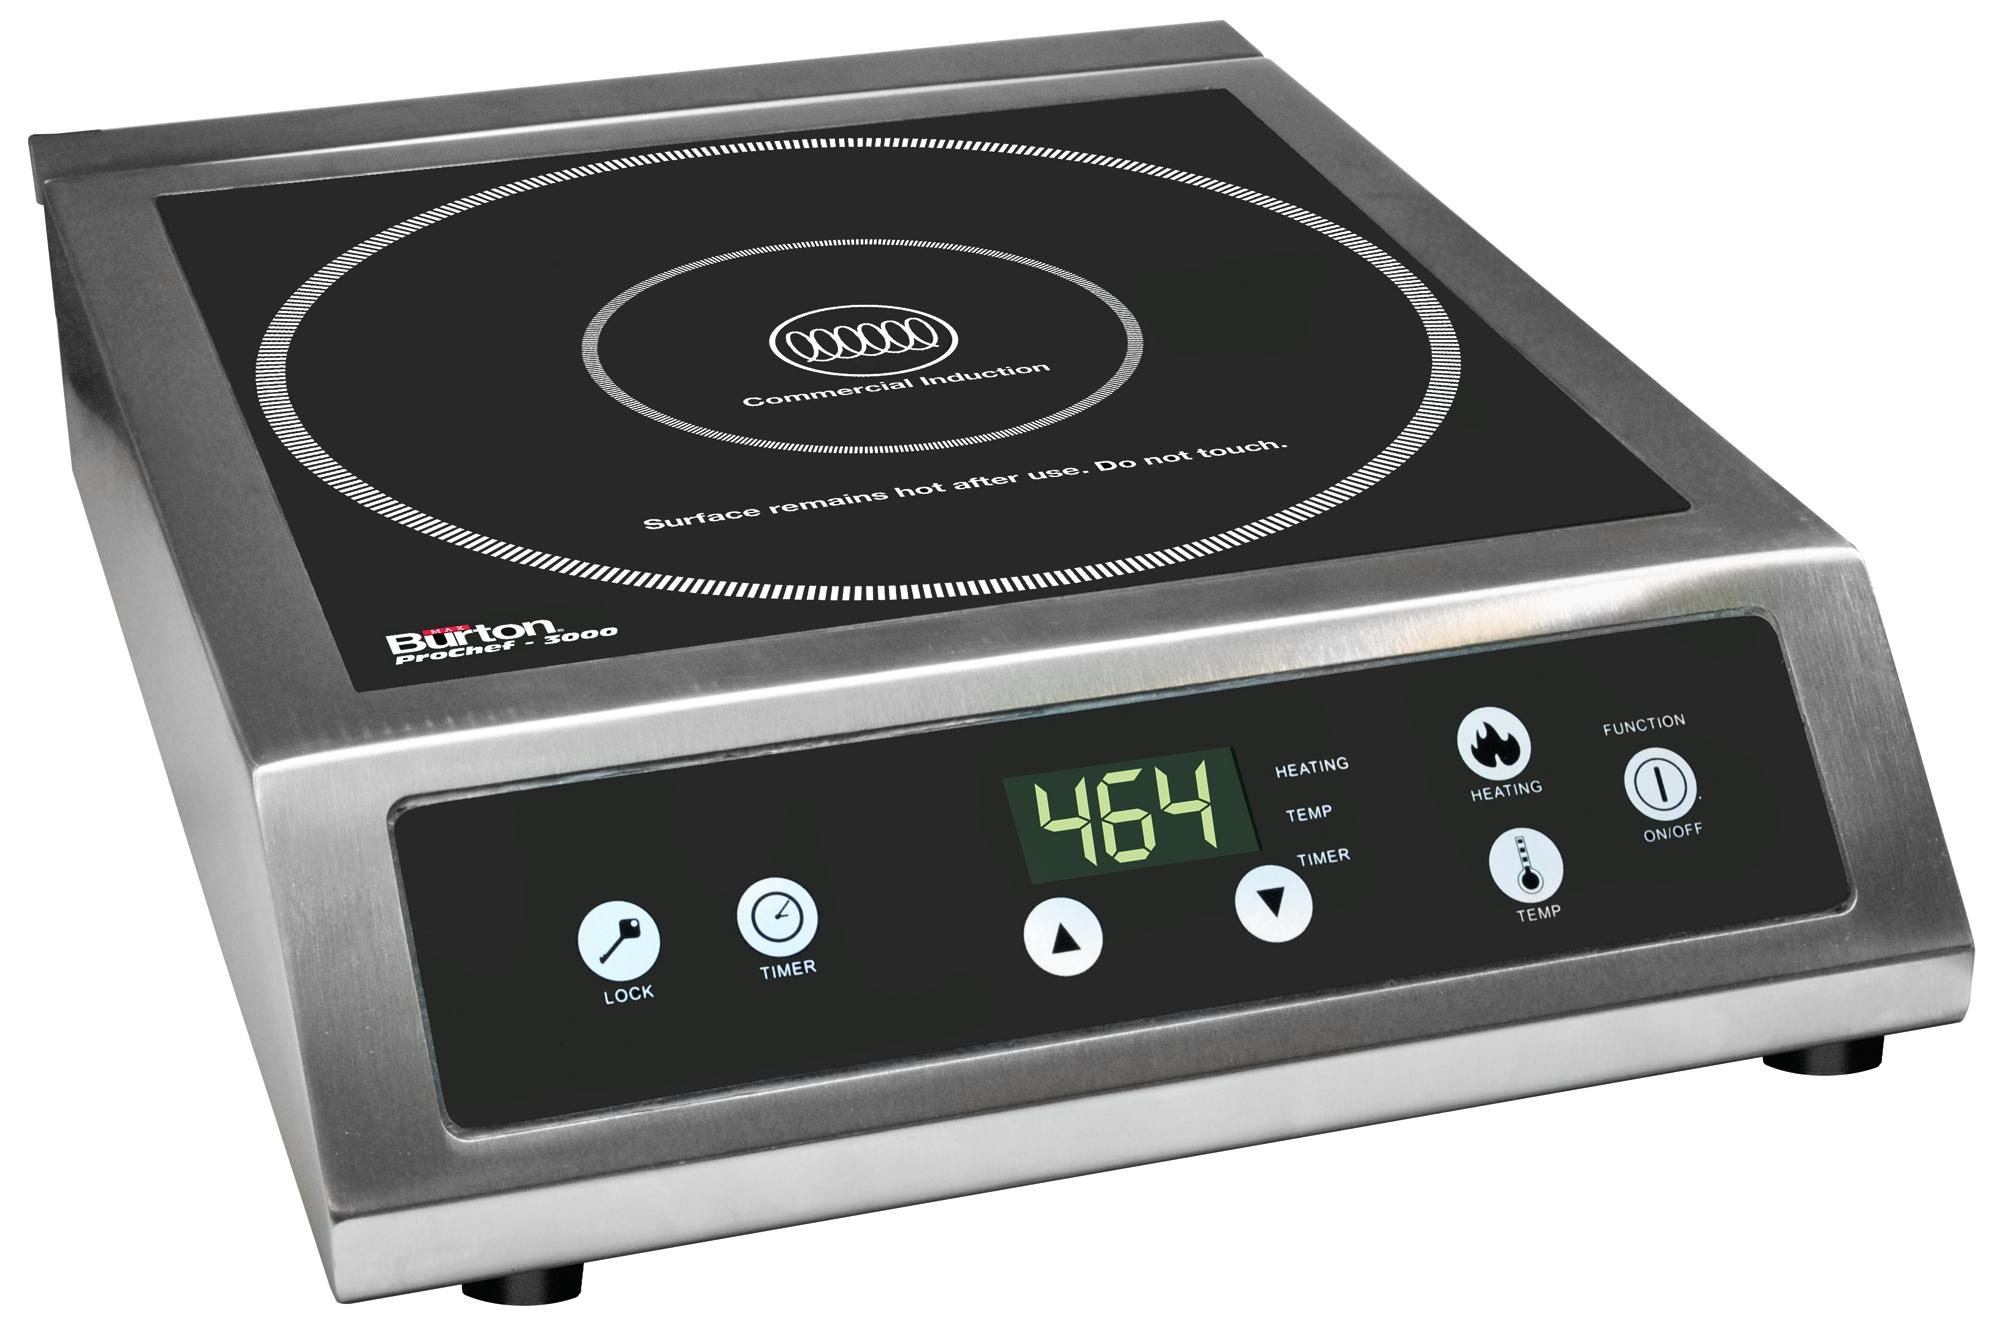 Max Burton 3000 Portable Induction Cooktop